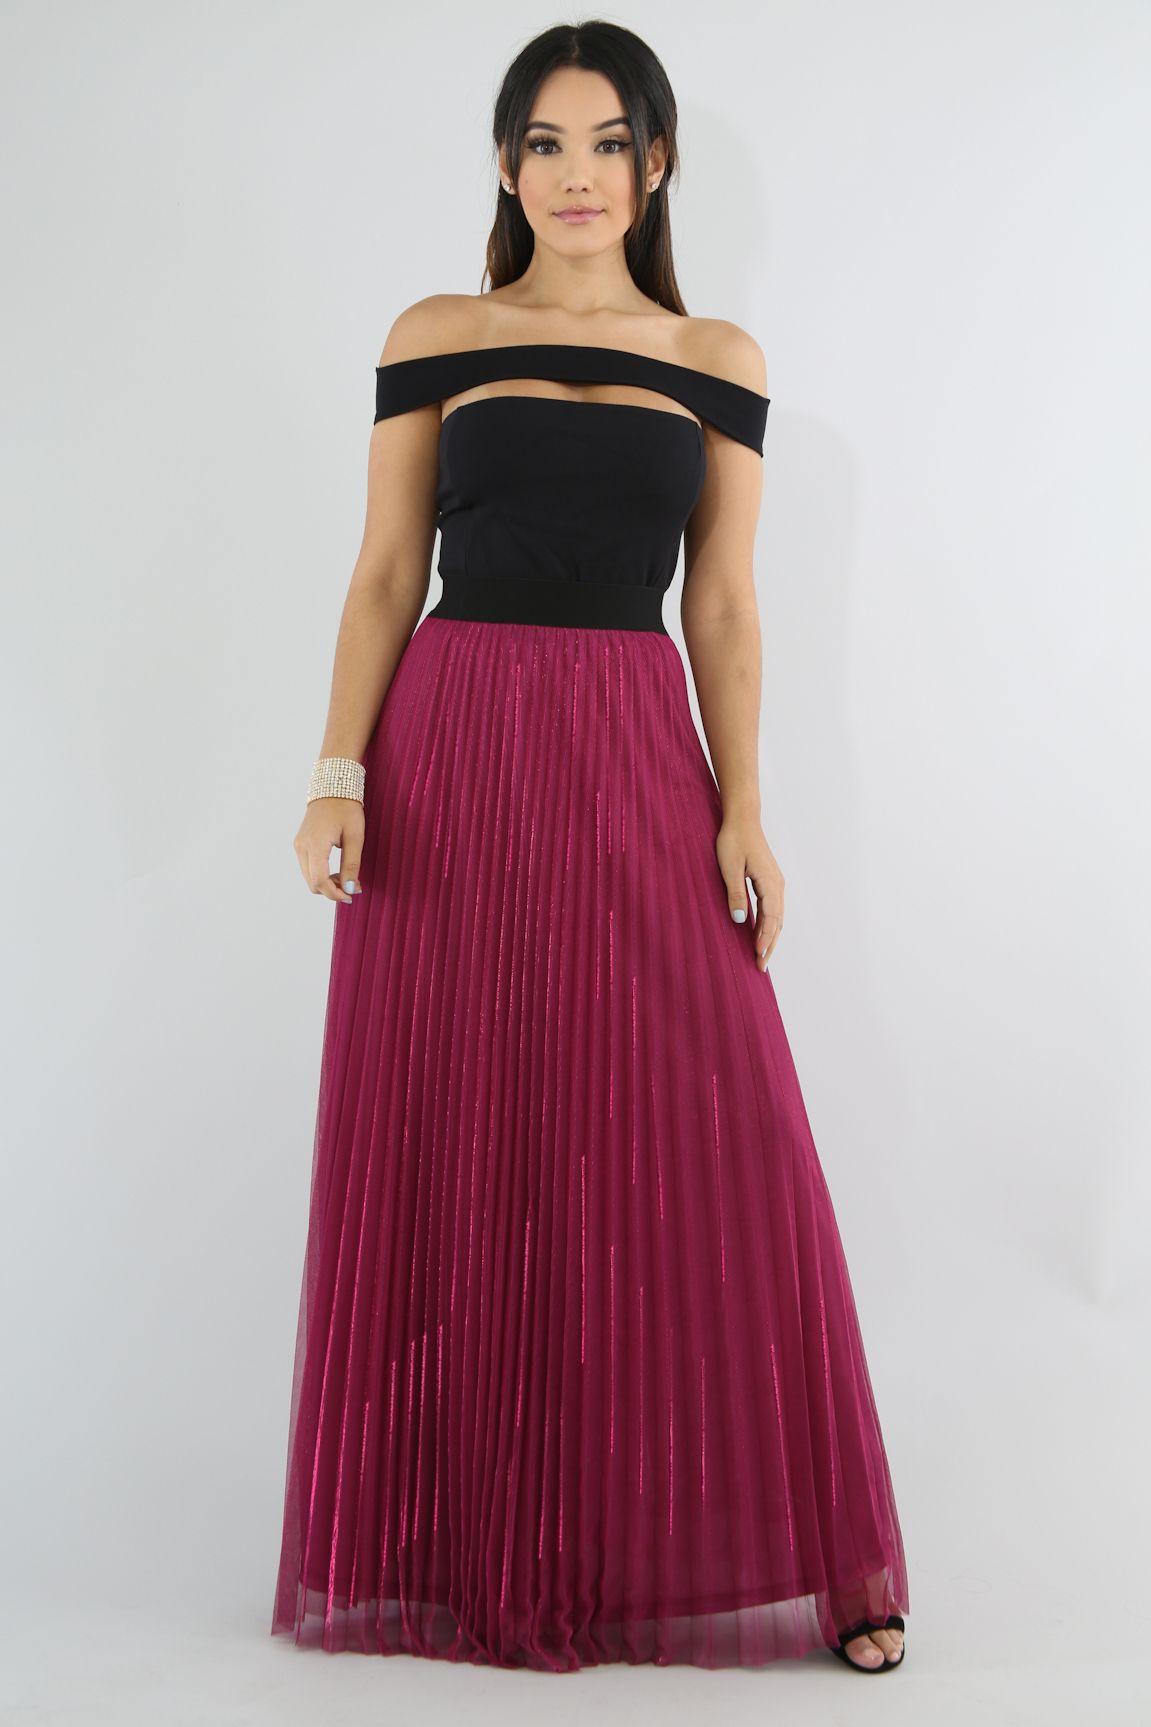 Sun shine pleated skirt long dresses pinterest online clothes